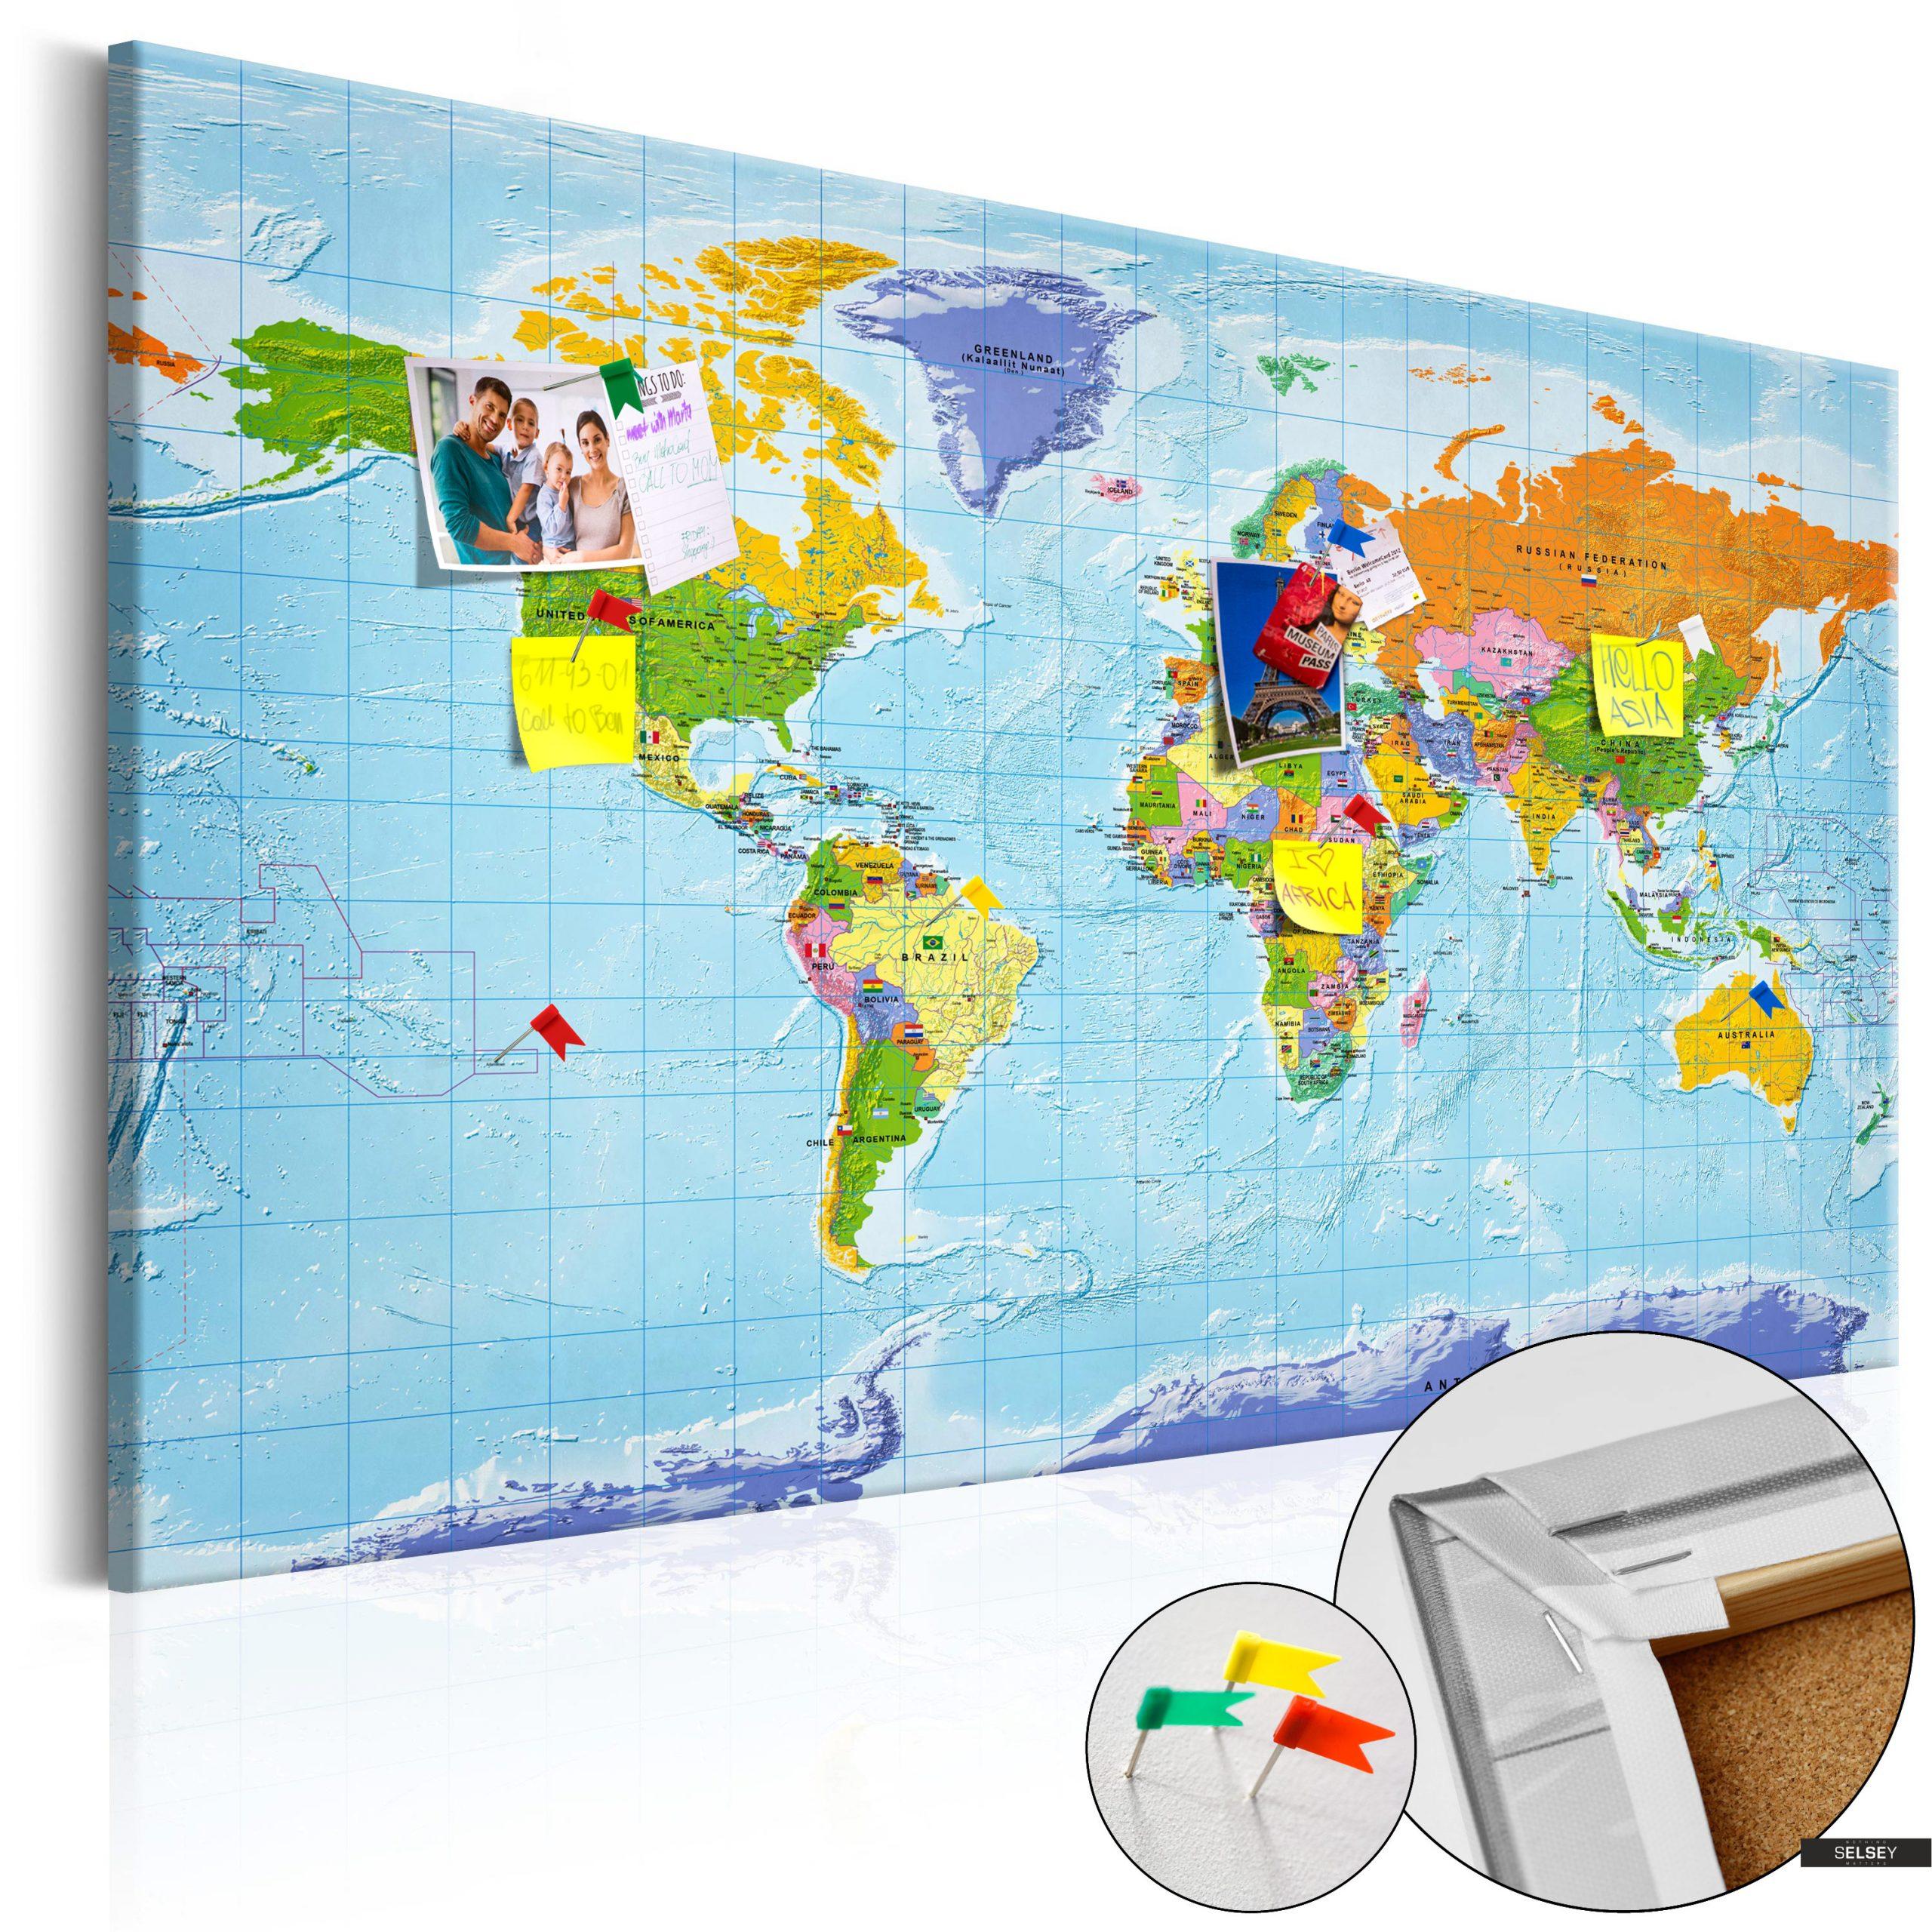 Pinnwand Weltkarte Mit Flaggen bei Weltkarte Mit Flaggen